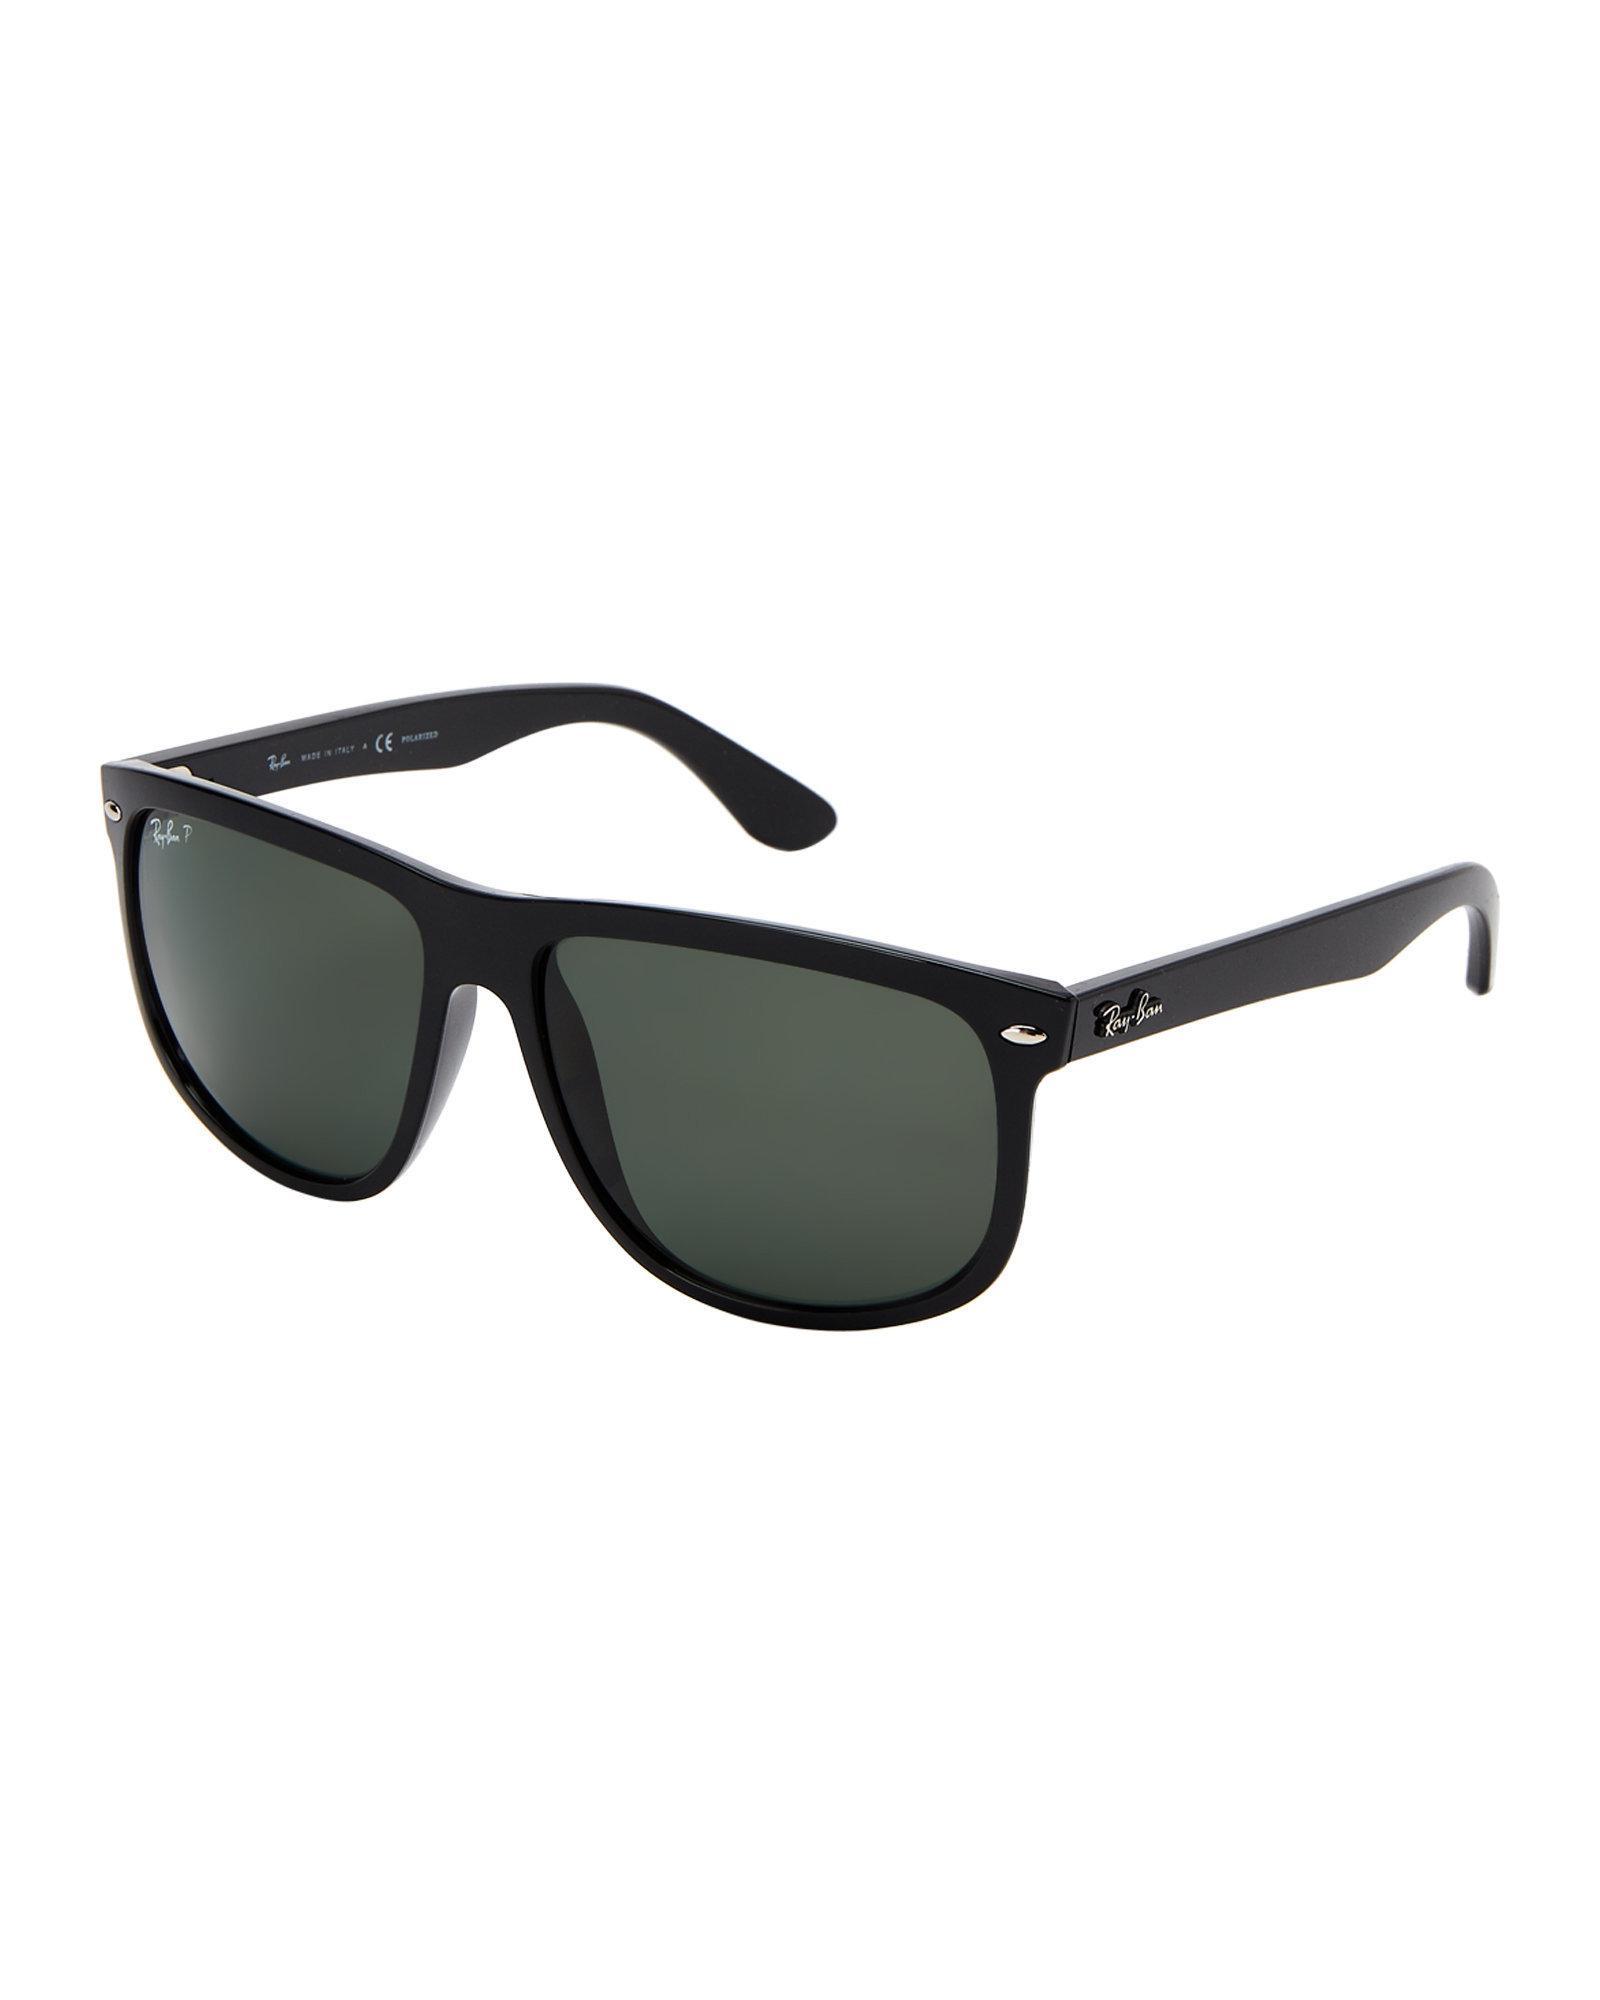 dcd410e605 Lyst - Ray-Ban Rb4147 Black Square Sunglasses in Black for Men